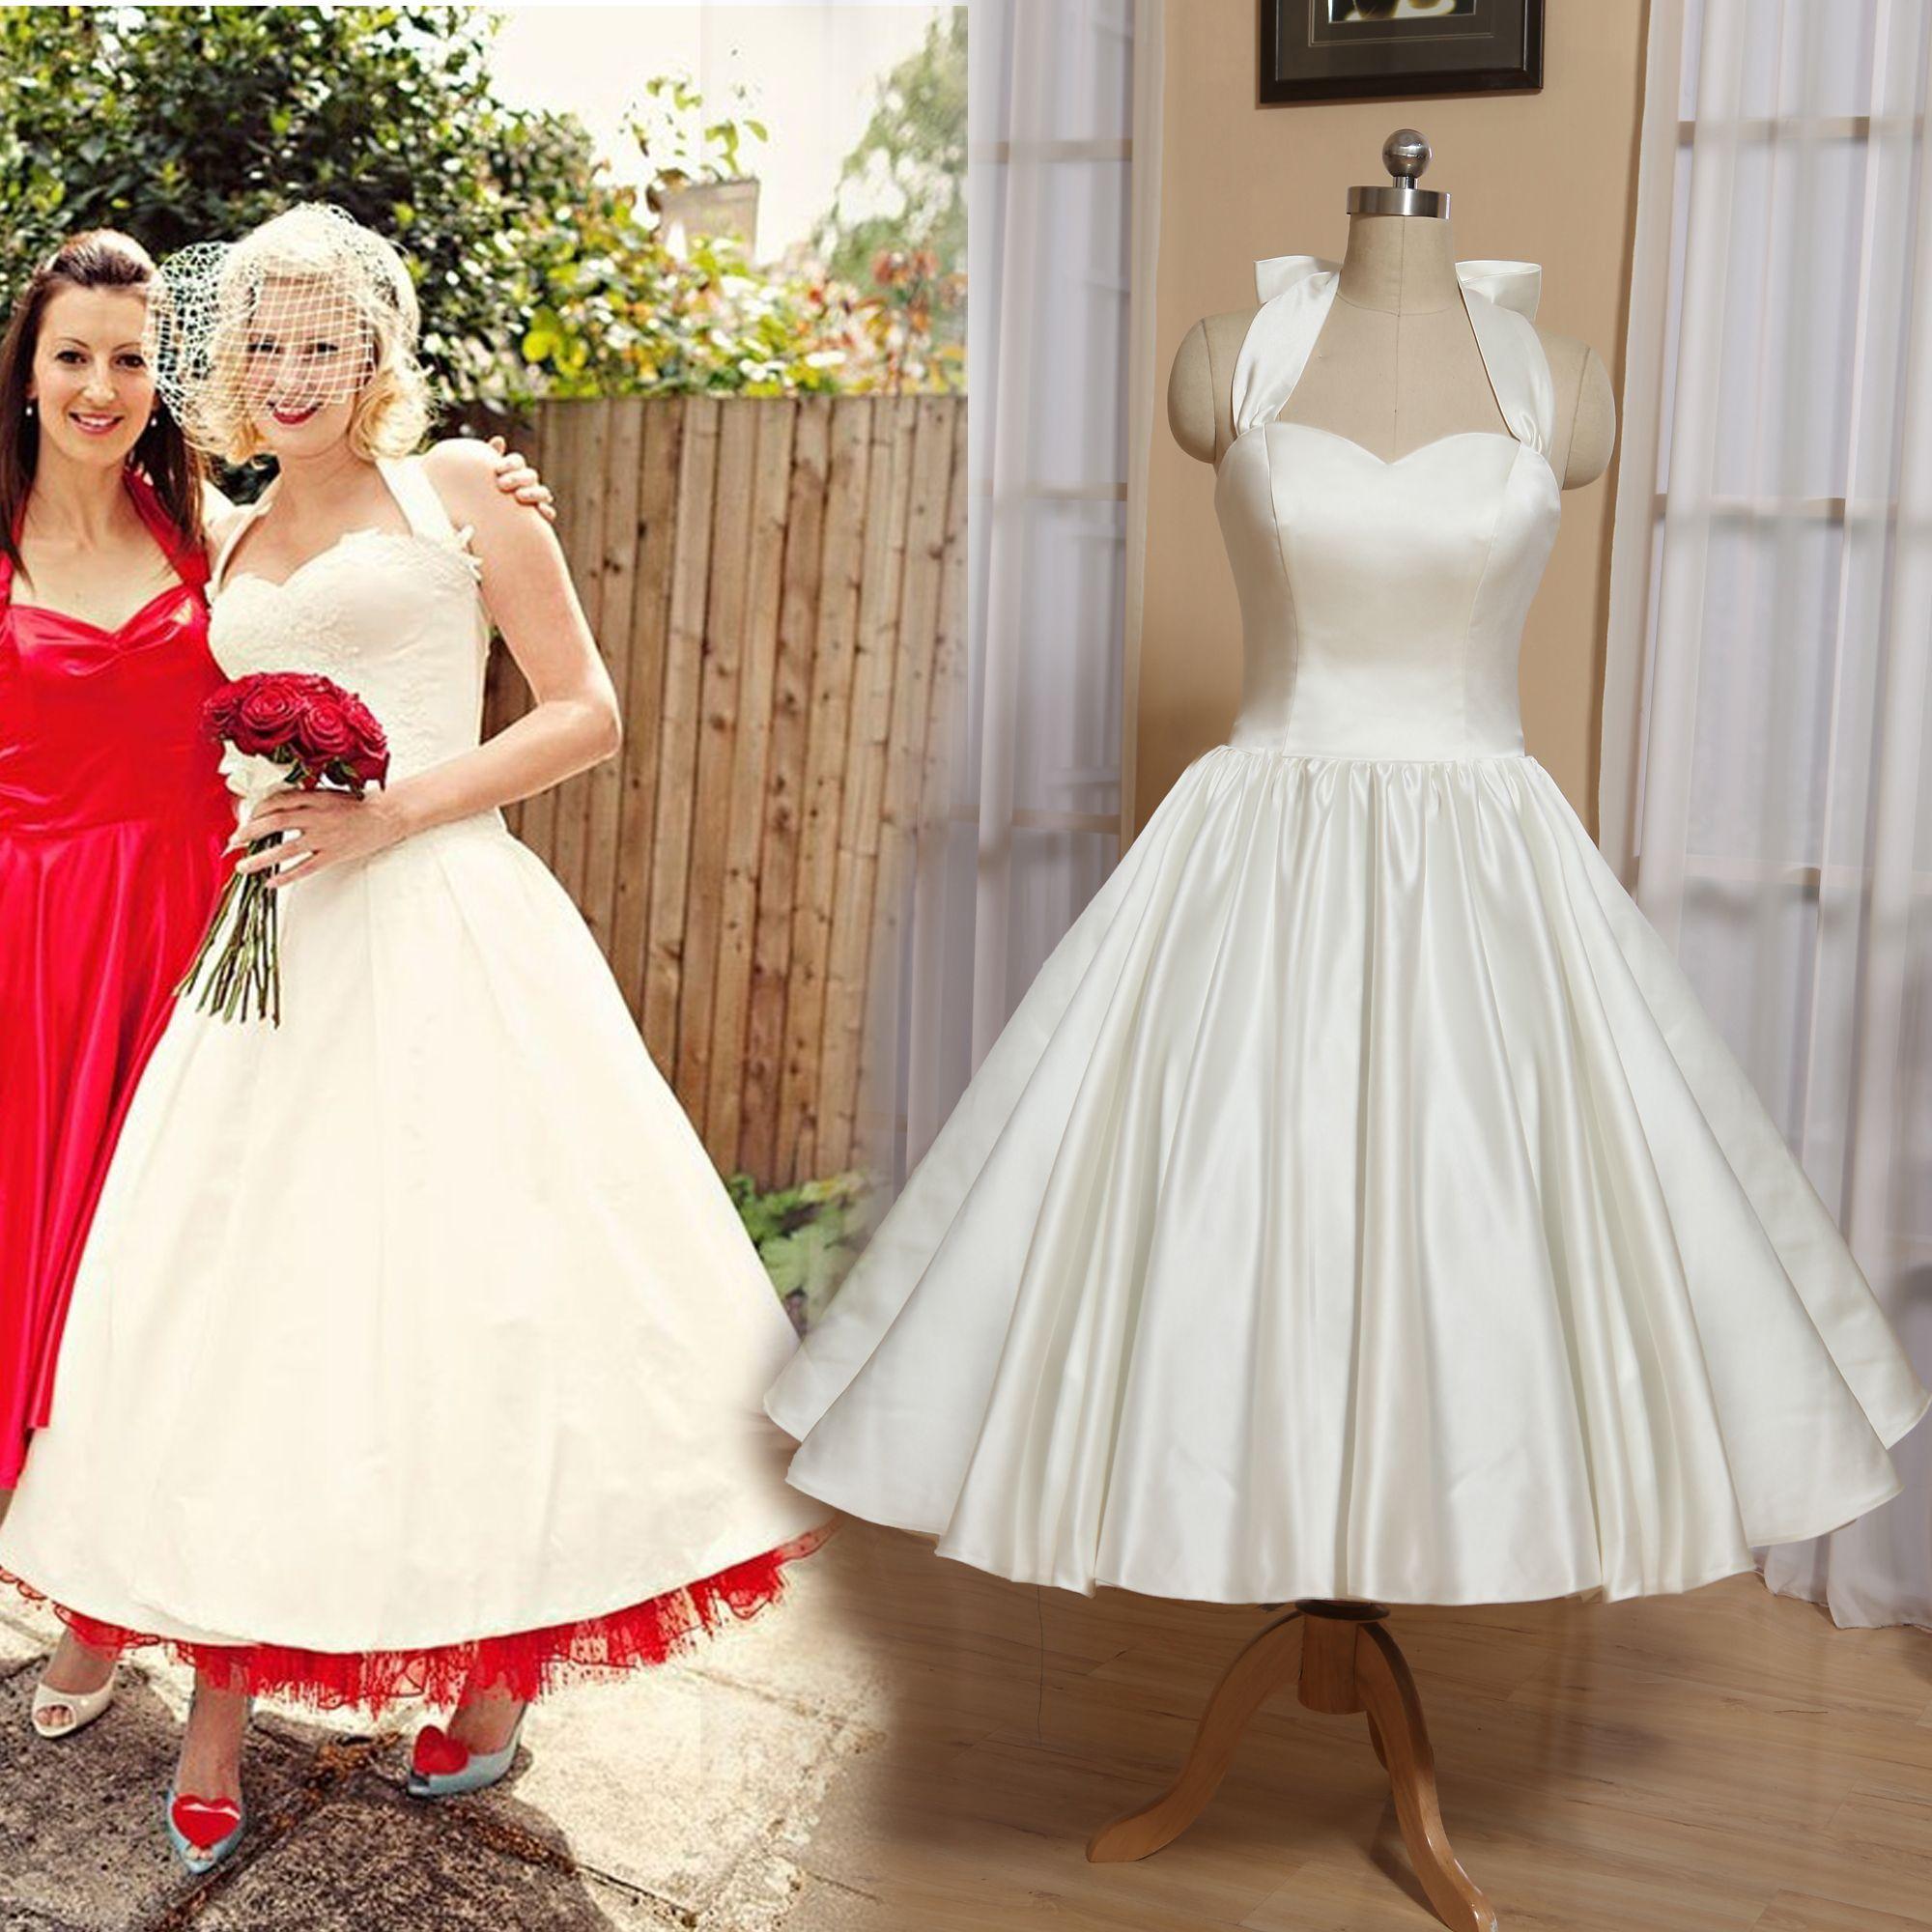 Discount Short Wedding Dresses 50s Dress Garden Tea Length Bridal Gowns Halter Neck Custom Size Vintage Inspired Gown Rll0002 Cheap: Short Vintage Inspired Wedding Dresses At Reisefeber.org